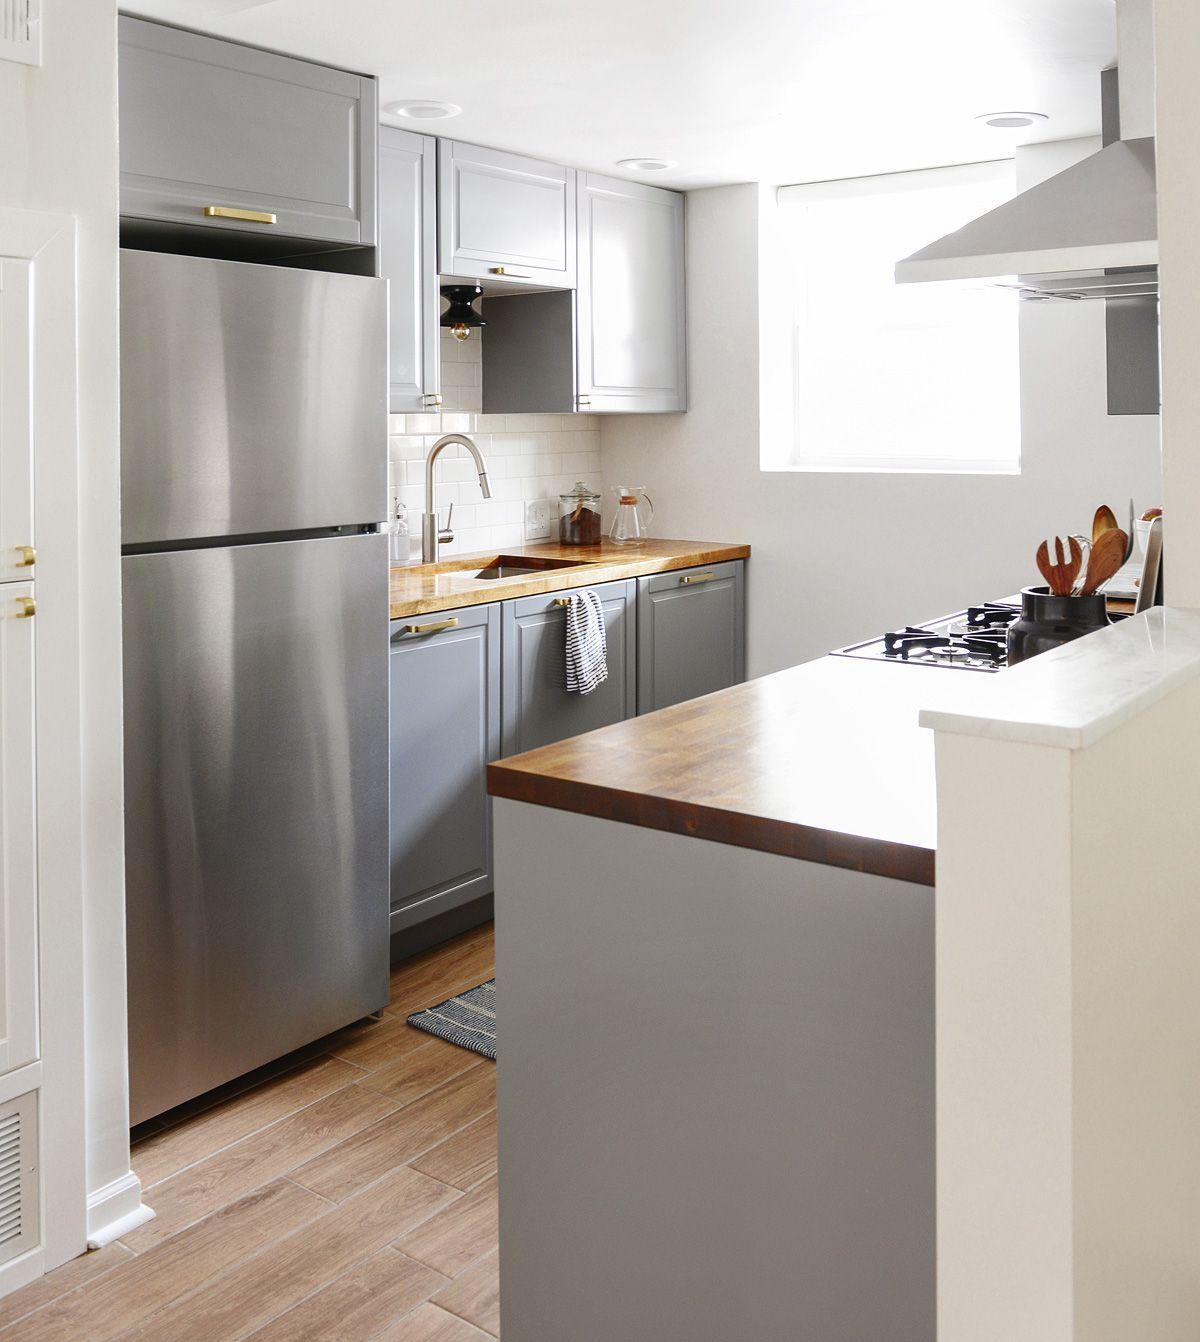 The Evolution of Our IKEA Kitchen! | Butcher block kitchen, Kitchen ...